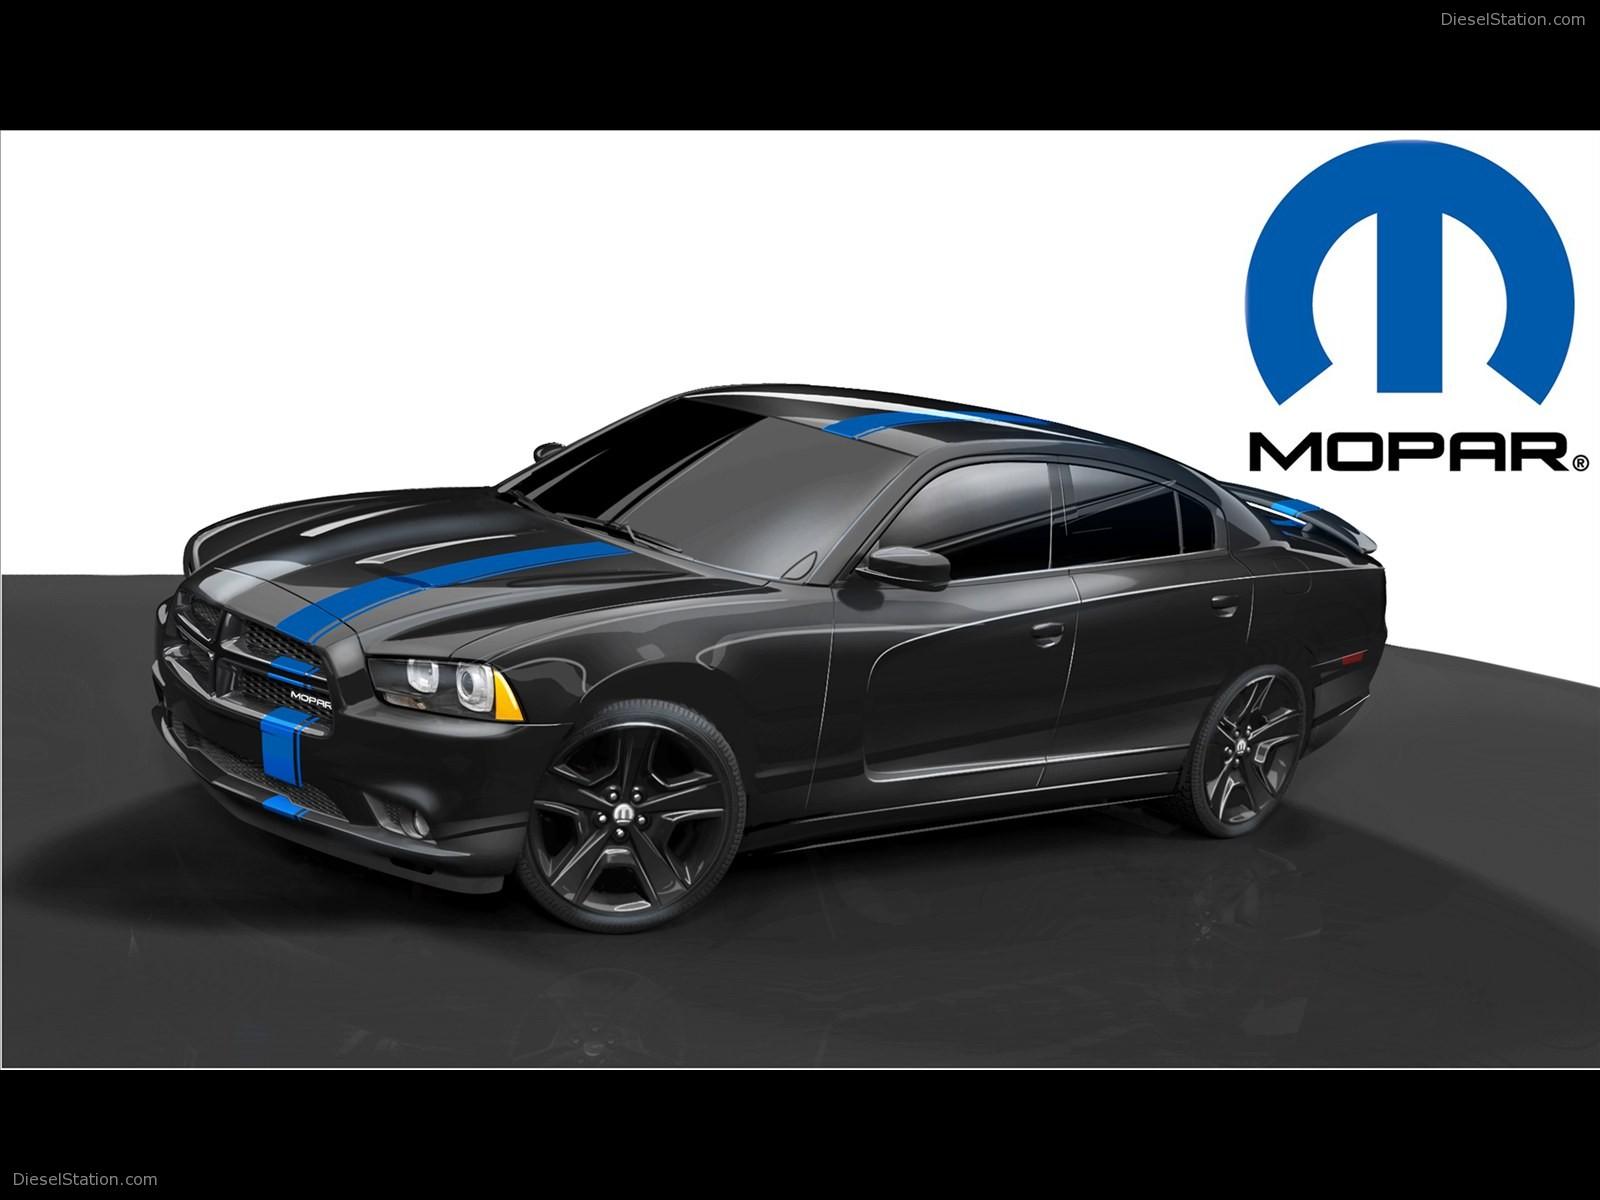 Home Dodge Dodge Charger Mopar 2011 1600x1200